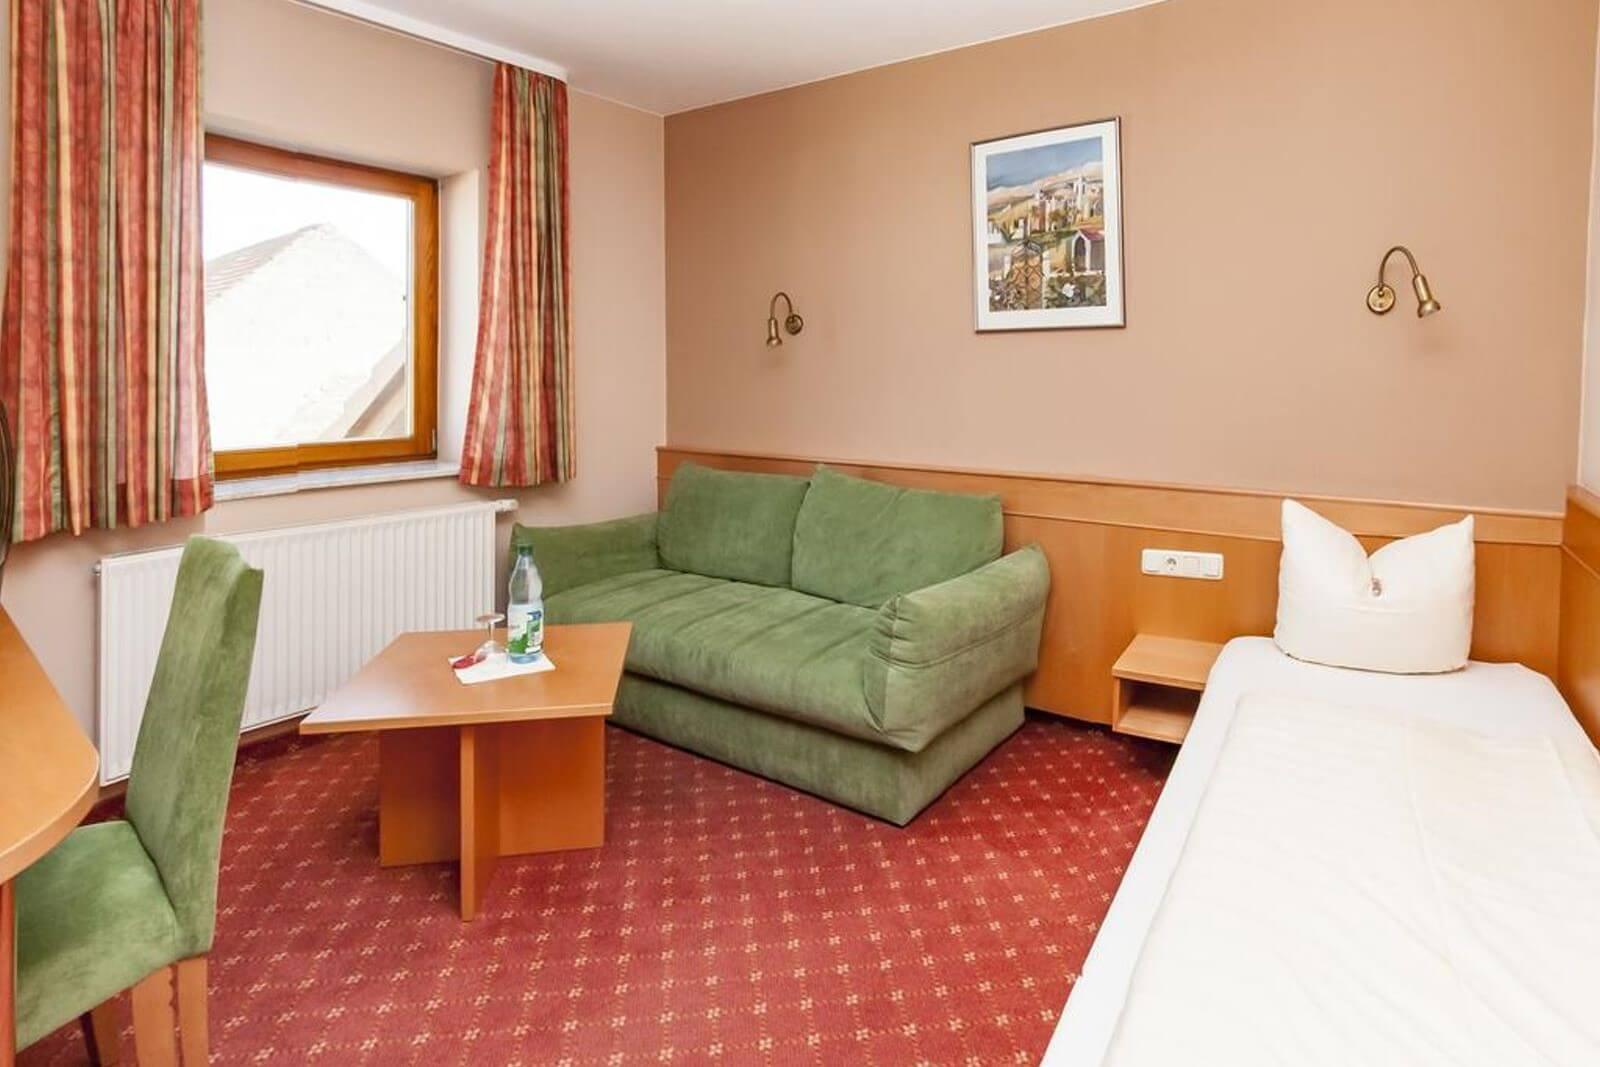 einzelzimmer-standard-hotel-pension-bett-fruehstueck-riedstadt3